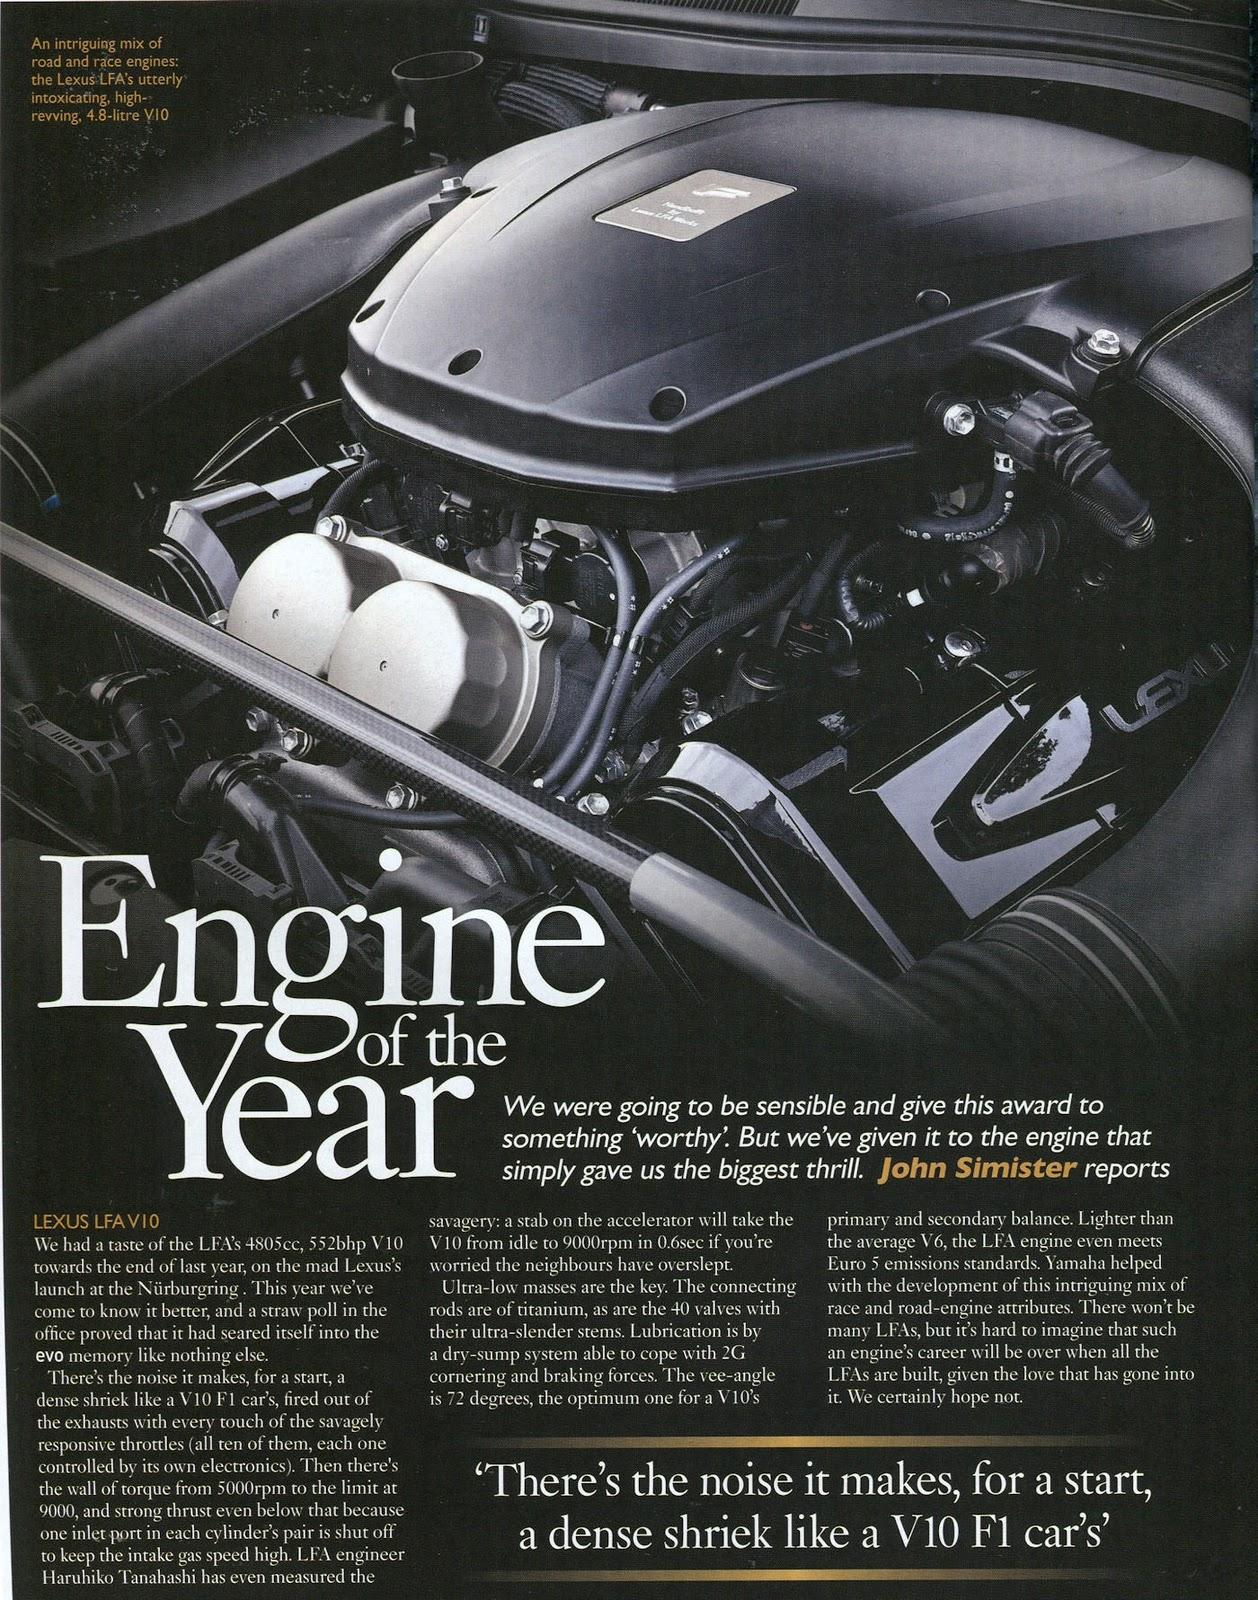 medium resolution of lfa s v10 engine wins best engine of the year award by evo uk